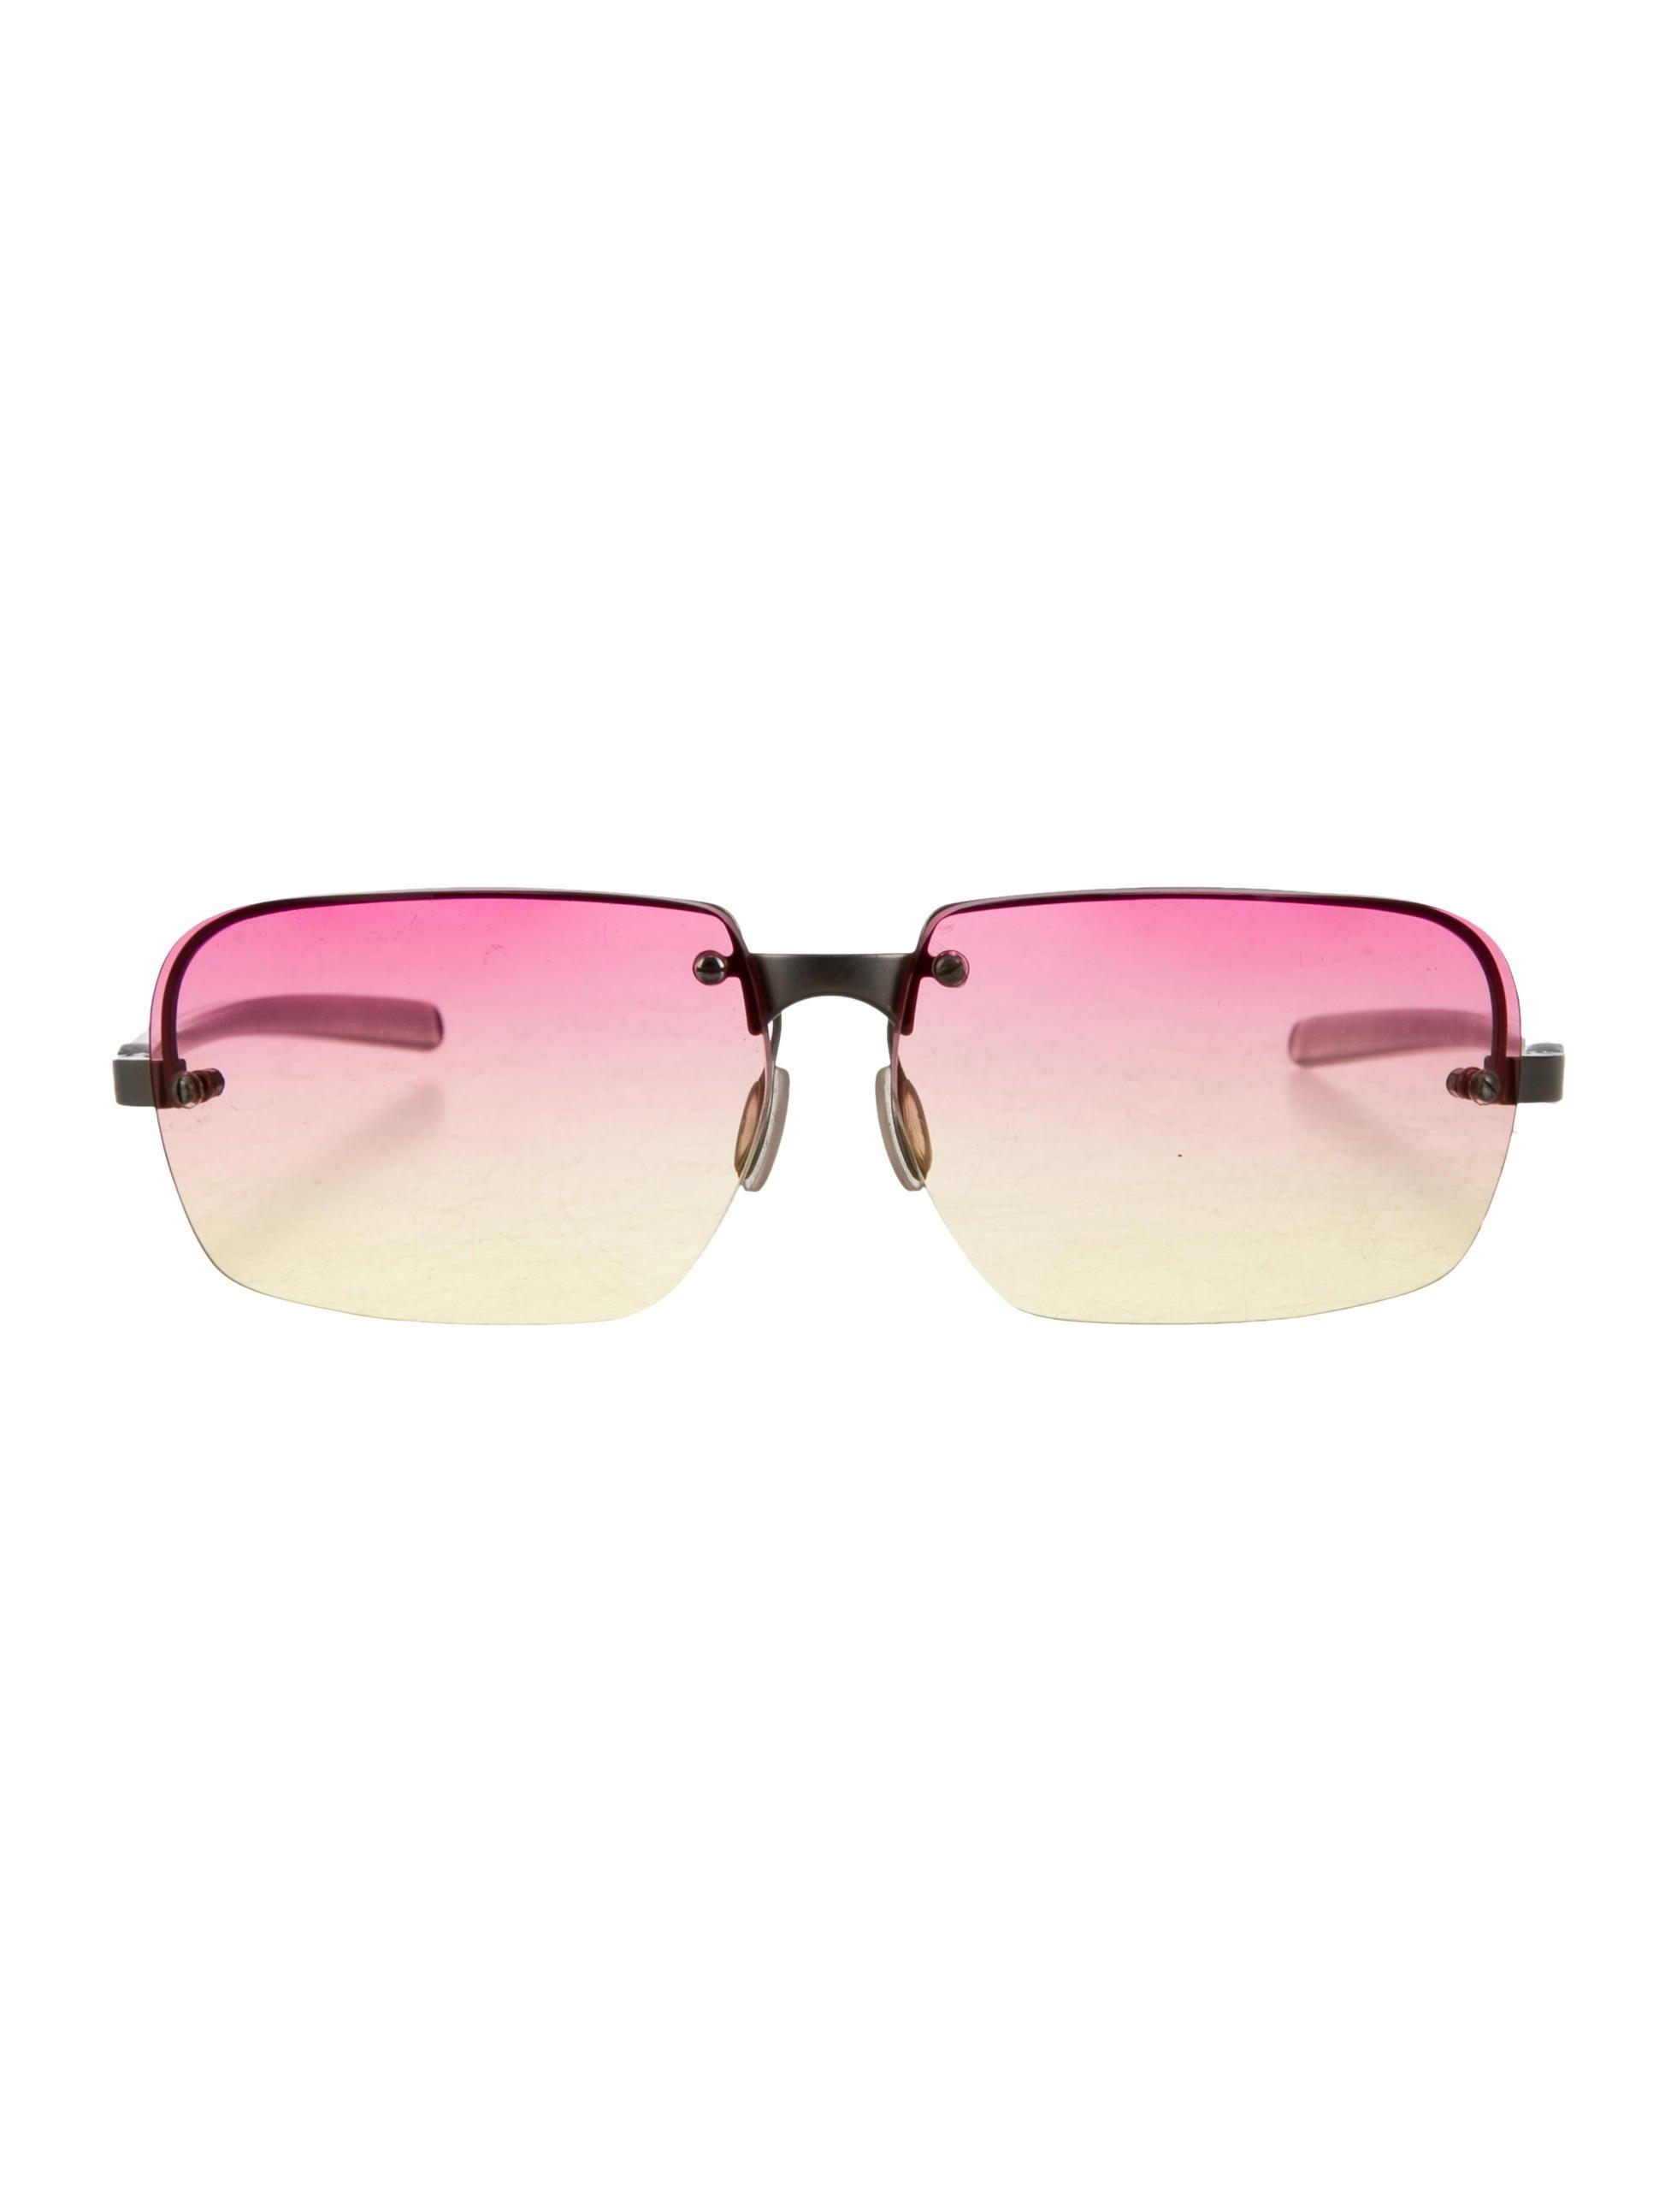 Rimless Glasses Look Good : Prada Rimless Logo Sunglasses - Accessories - PRA141202 ...